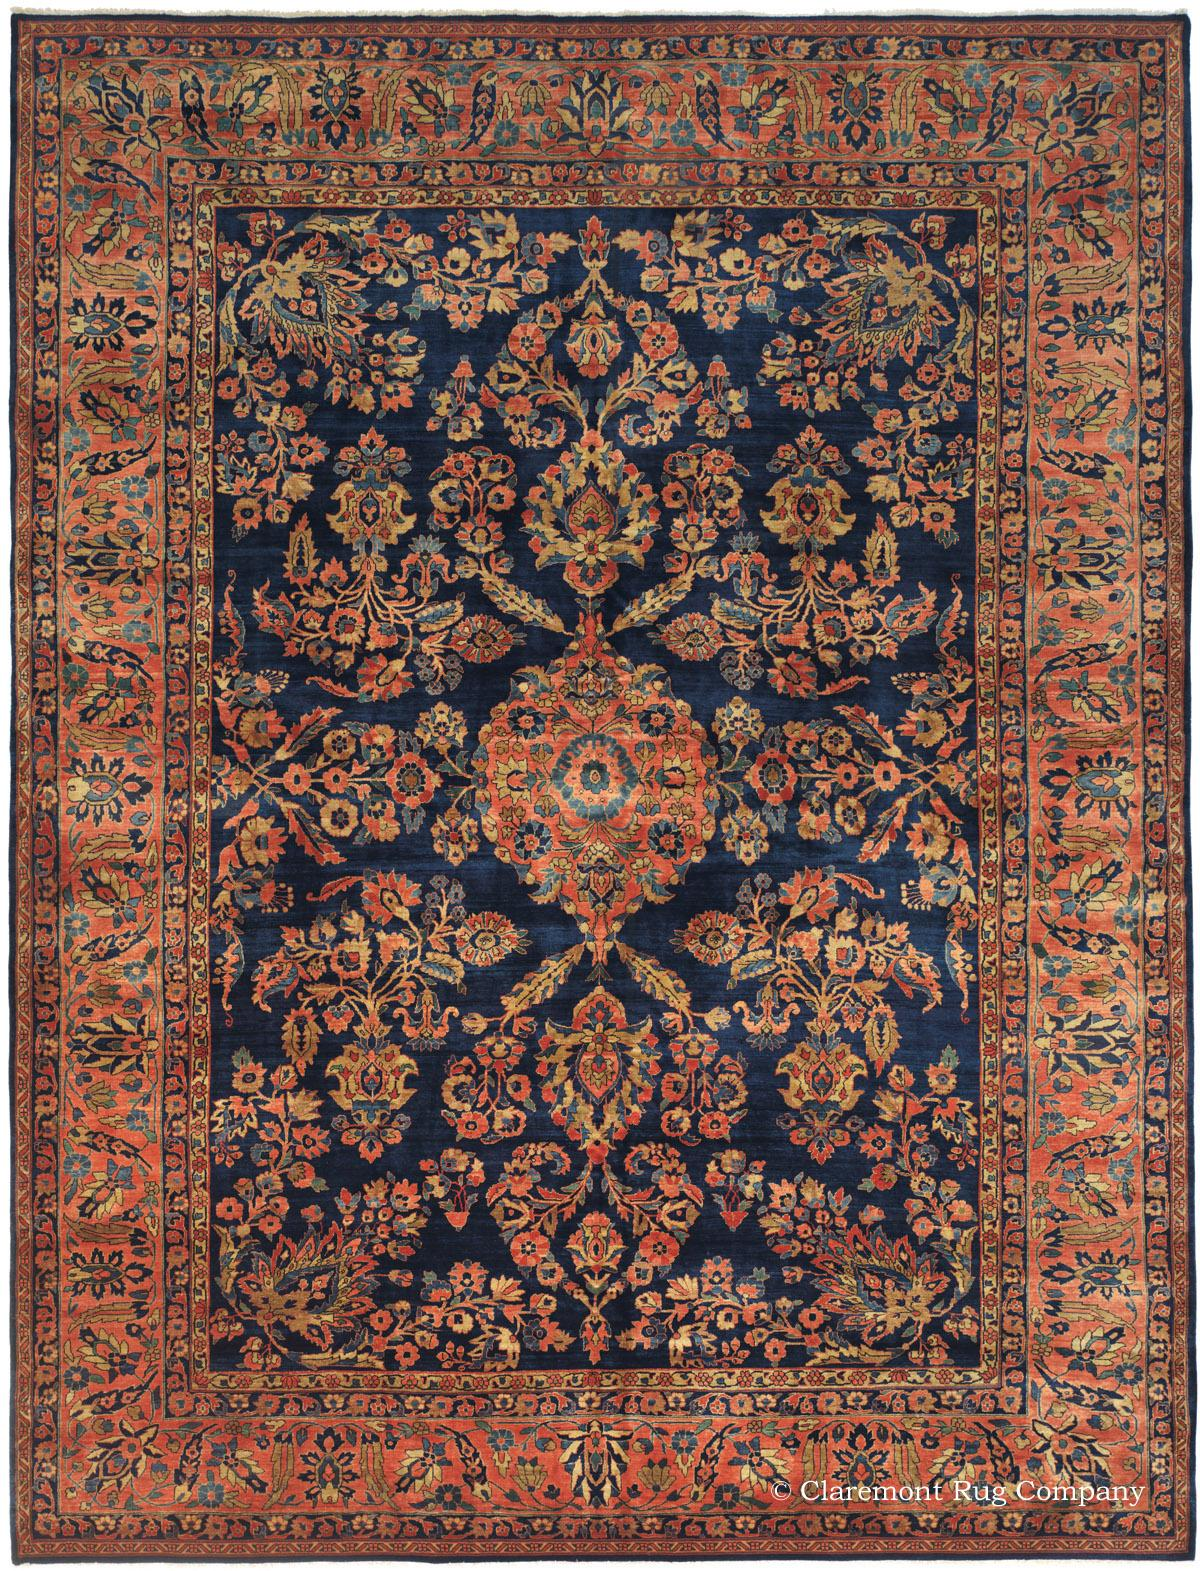 MAHAJIRAN SAROUK, West Central Persian Antique Rug - Claremont Rug Company